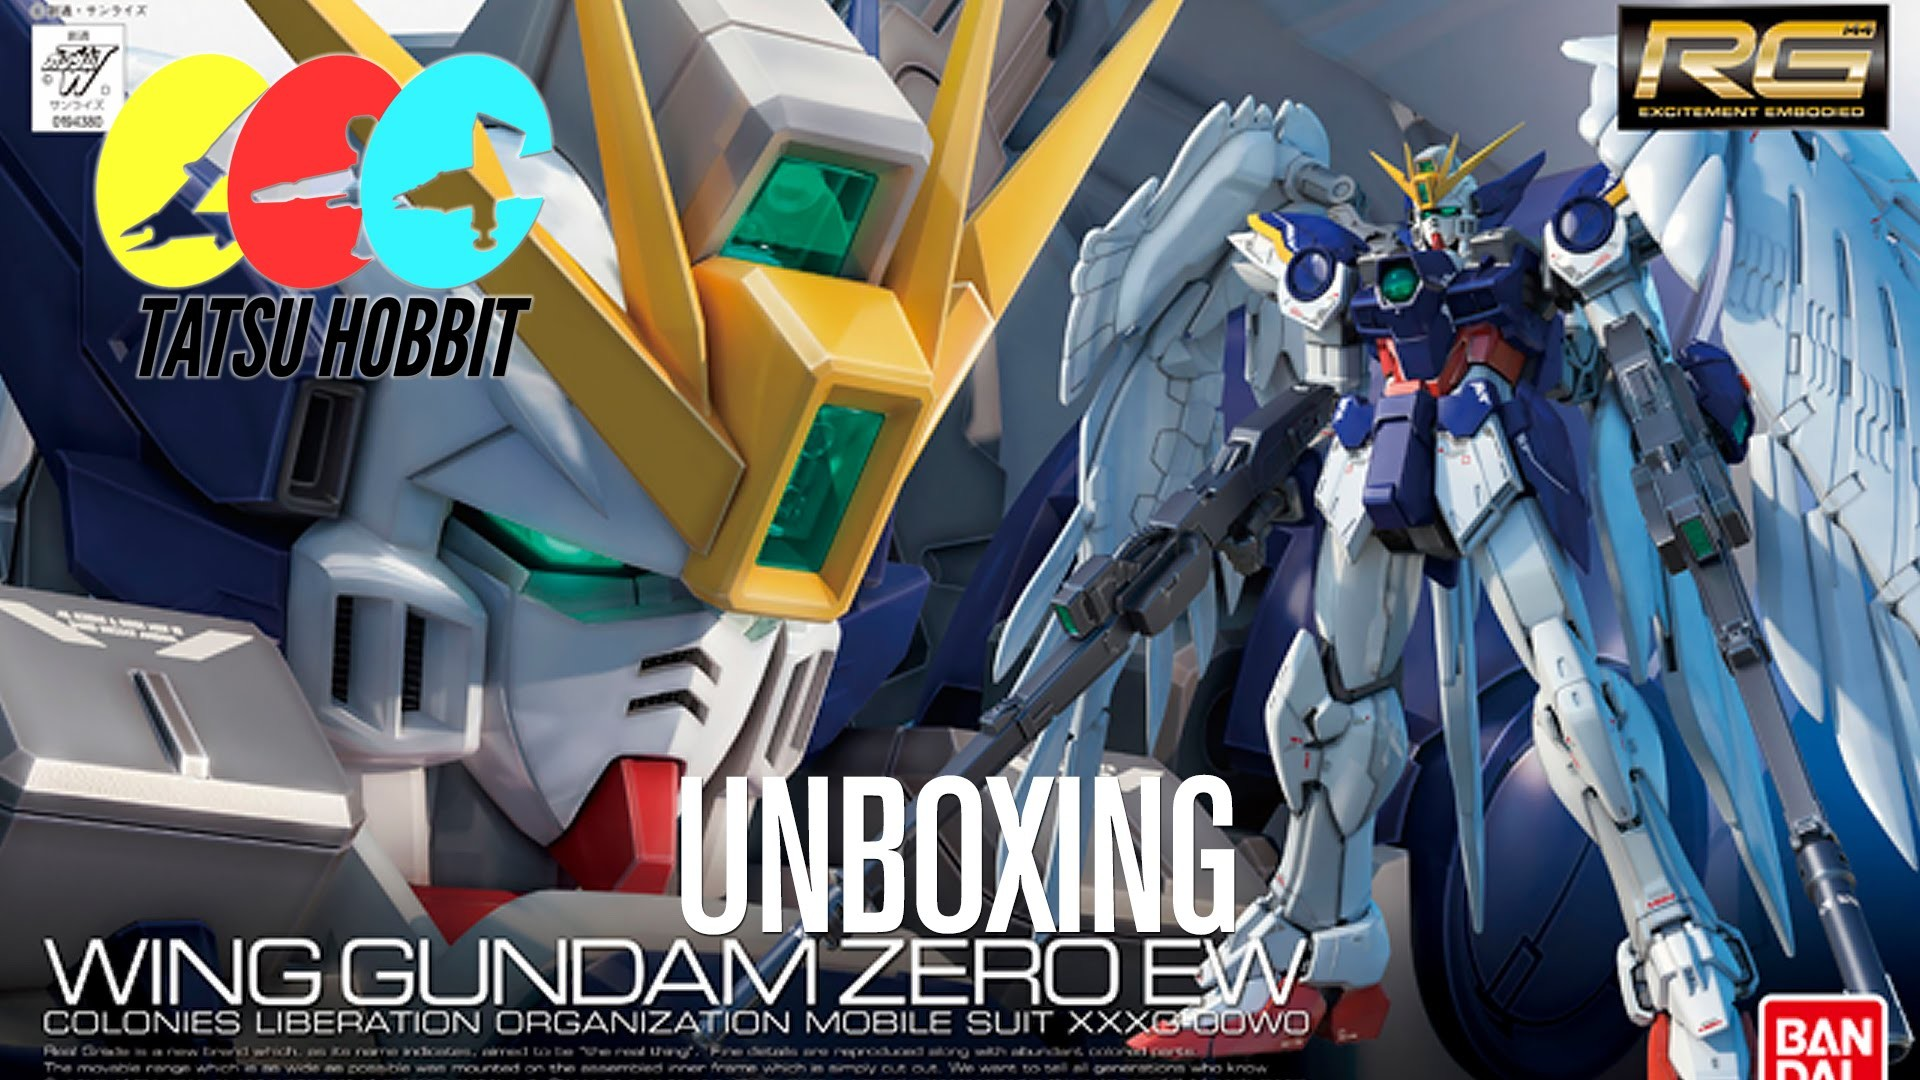 RG Wing Zero Custom ウイングガンダムゼロ UNBOXING – Mobile Suit Gundam Wing Endless  Waltz